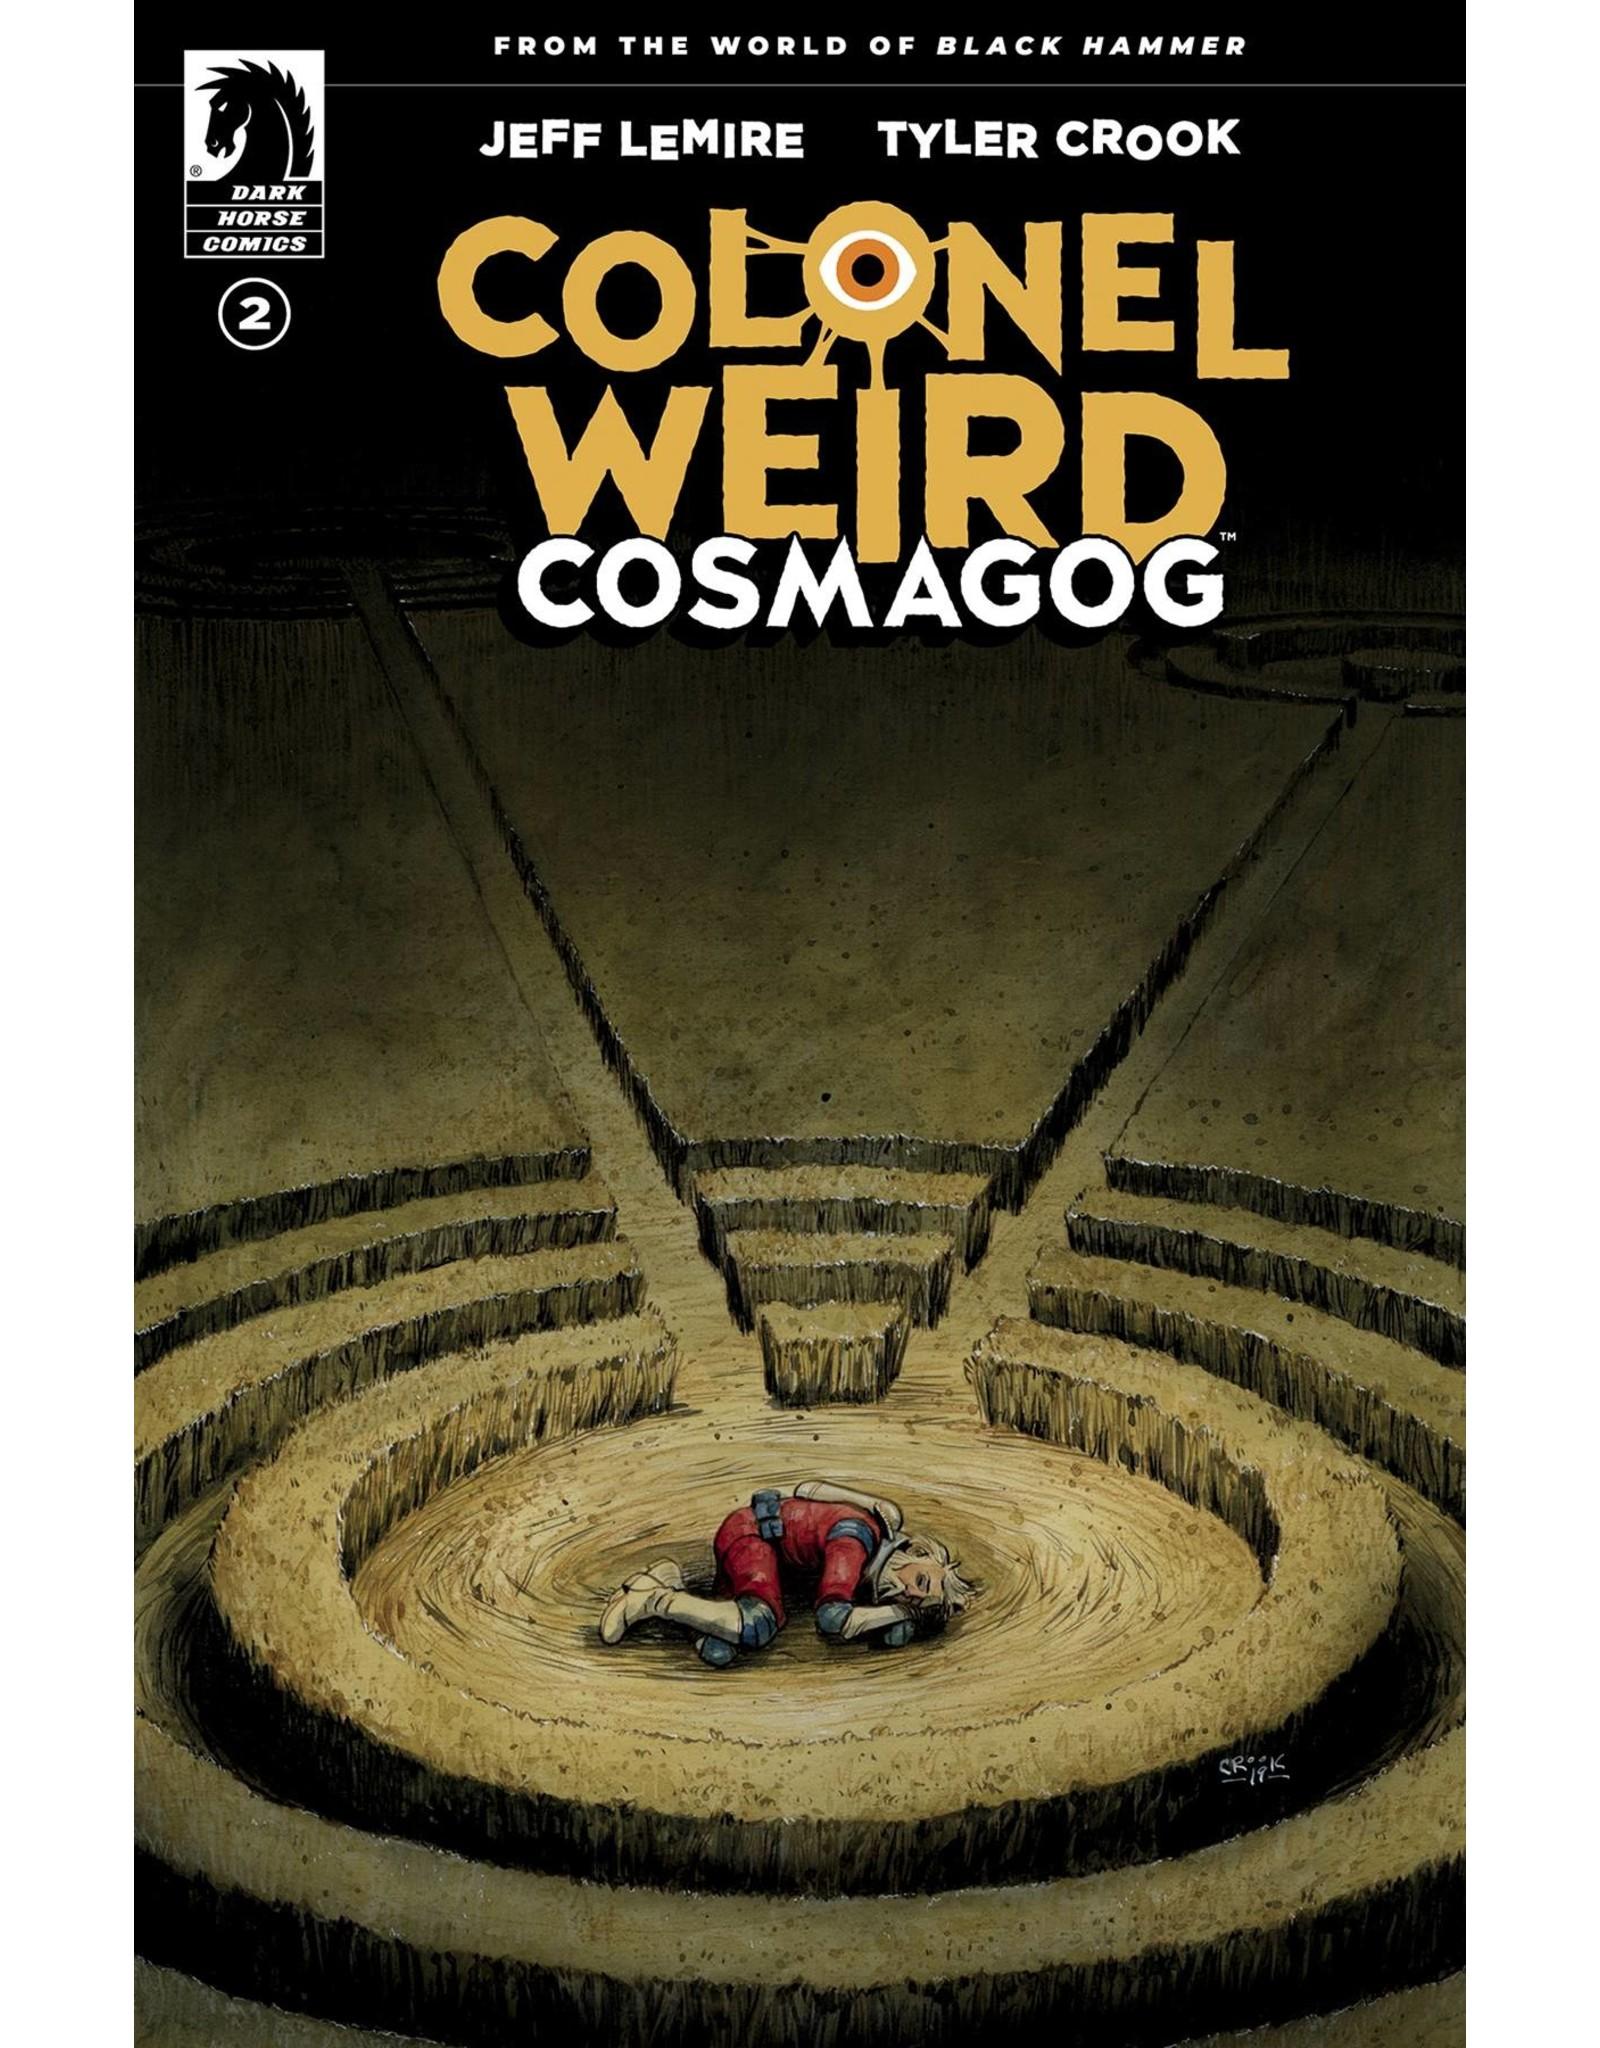 DARK HORSE COMICS COLONEL WEIRD COSMAGOG #2 (OF 4) CVR A CROOK